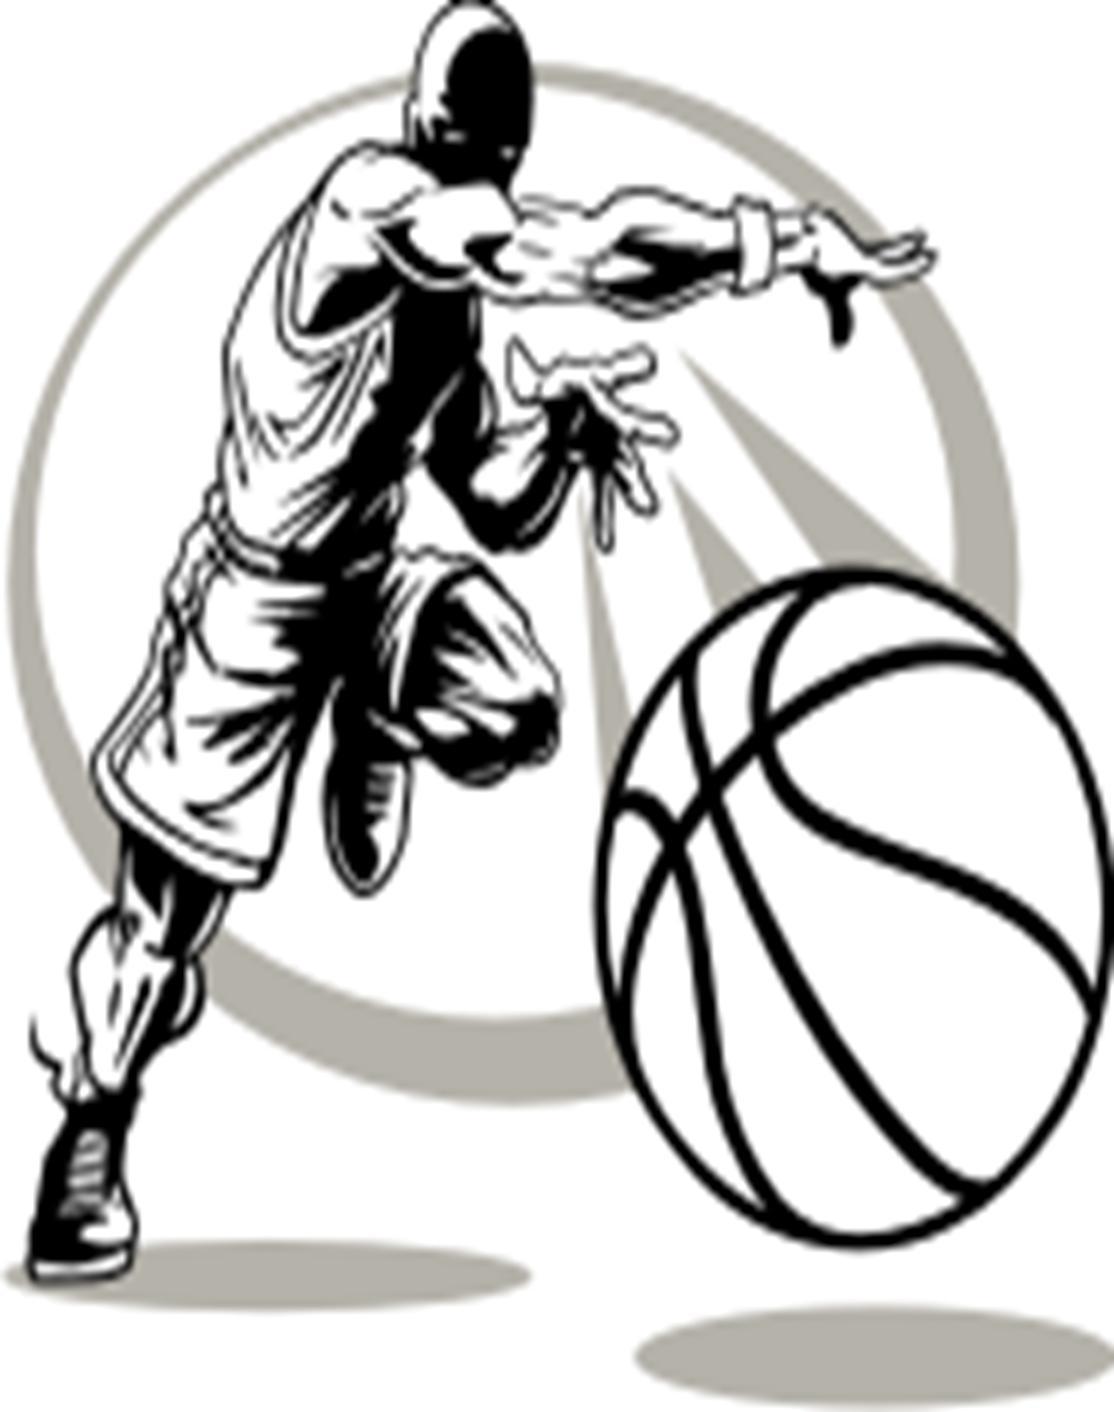 Basketball Coach Clipart - Cliparts.co (1114 x 1412 Pixel)